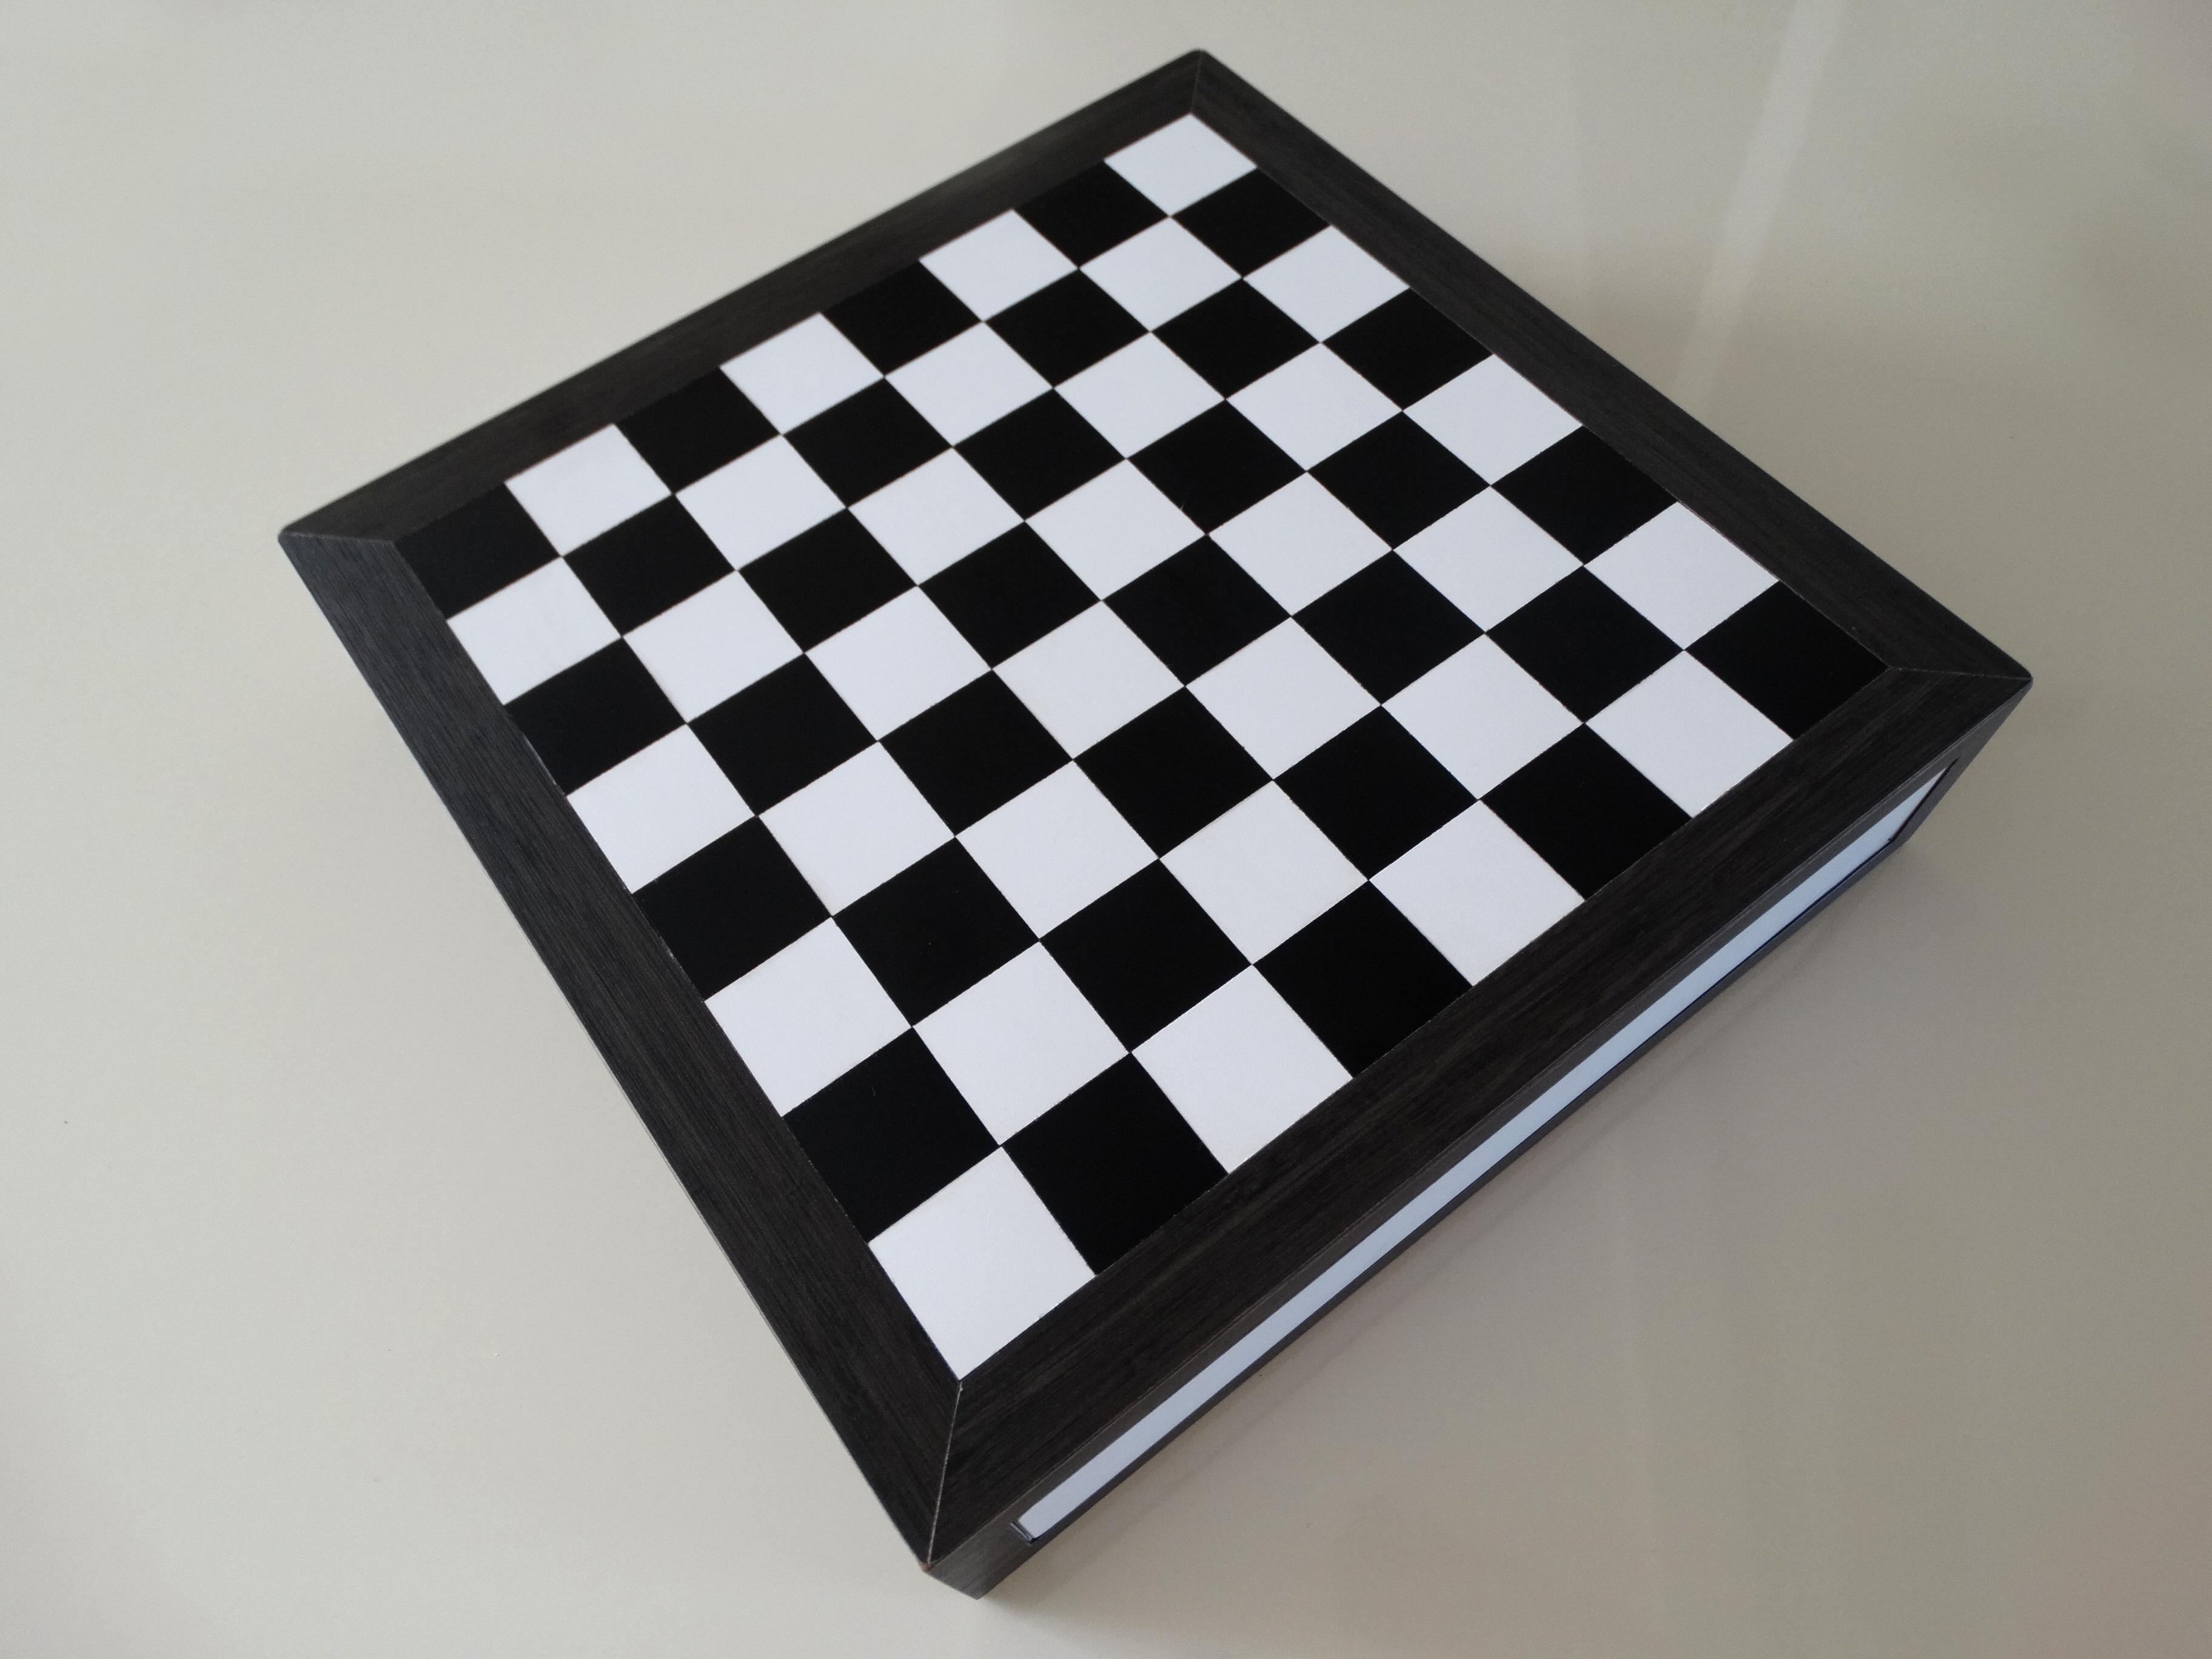 chessboard by david jan at coroflot com